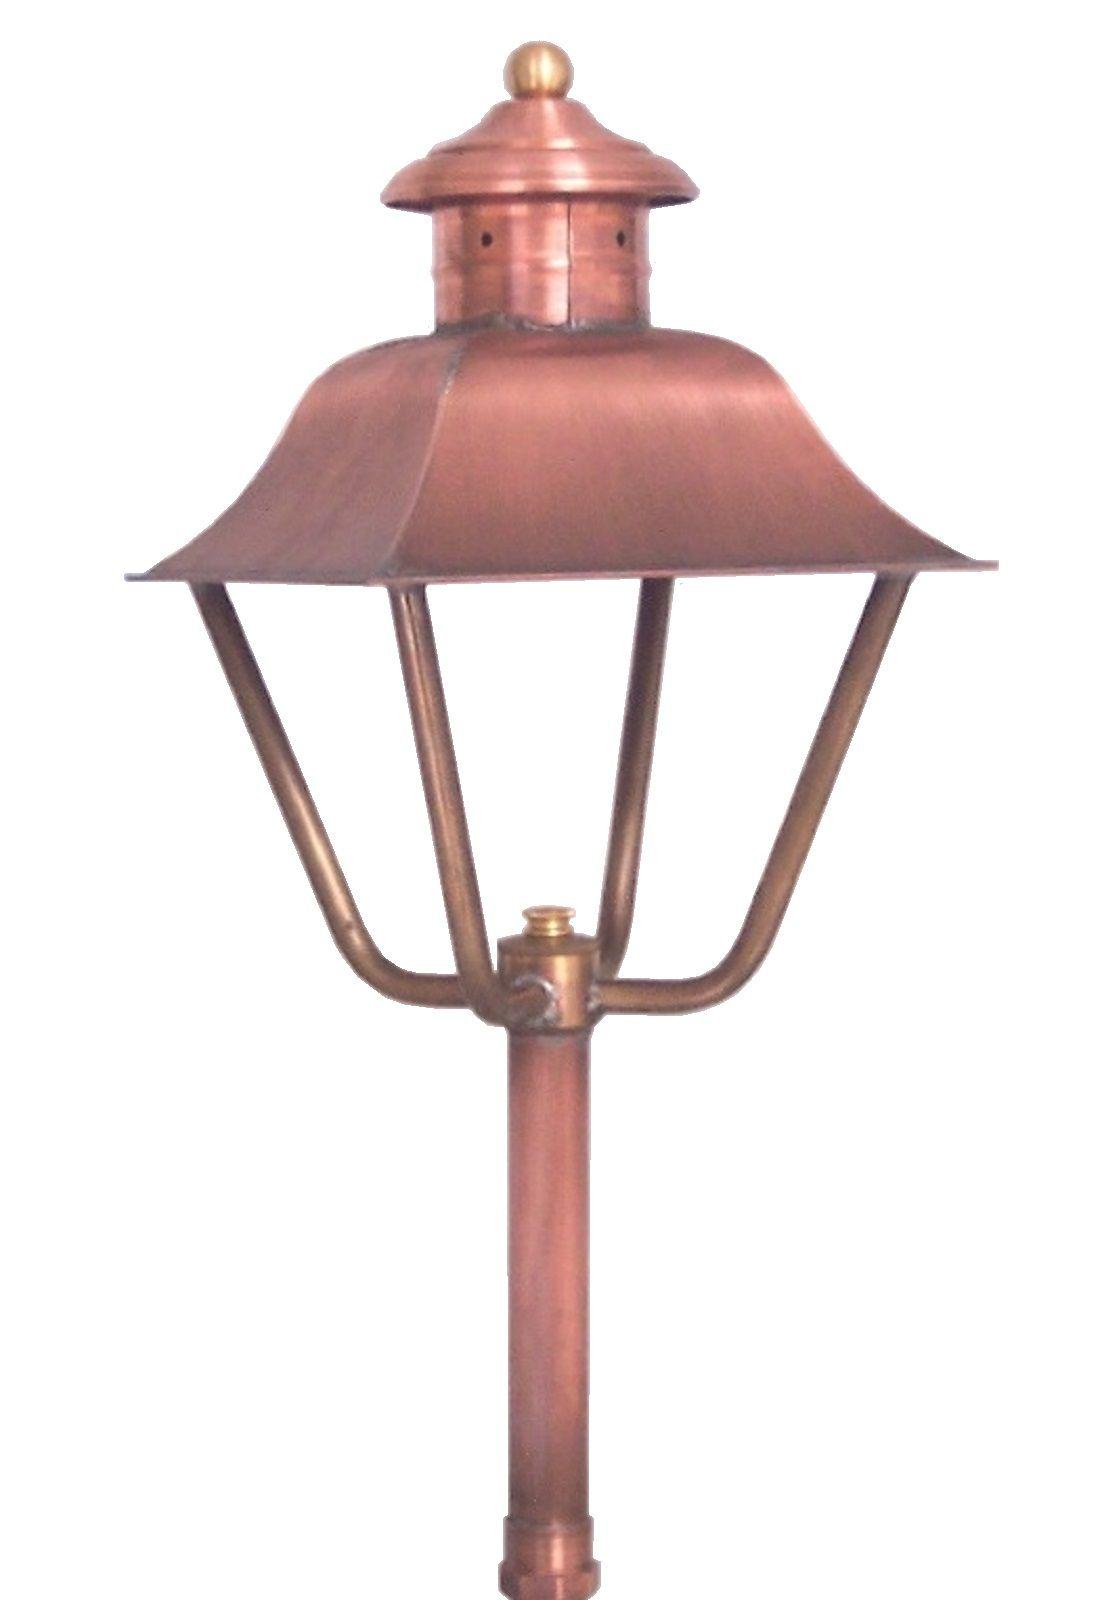 Brass Traditions Lighting 1950 Garden Light In Antique Copper Brasstraditions Ctmade Handcrafted Solid Copper Lighting Farmhouse Lighting Outdoor Lighting